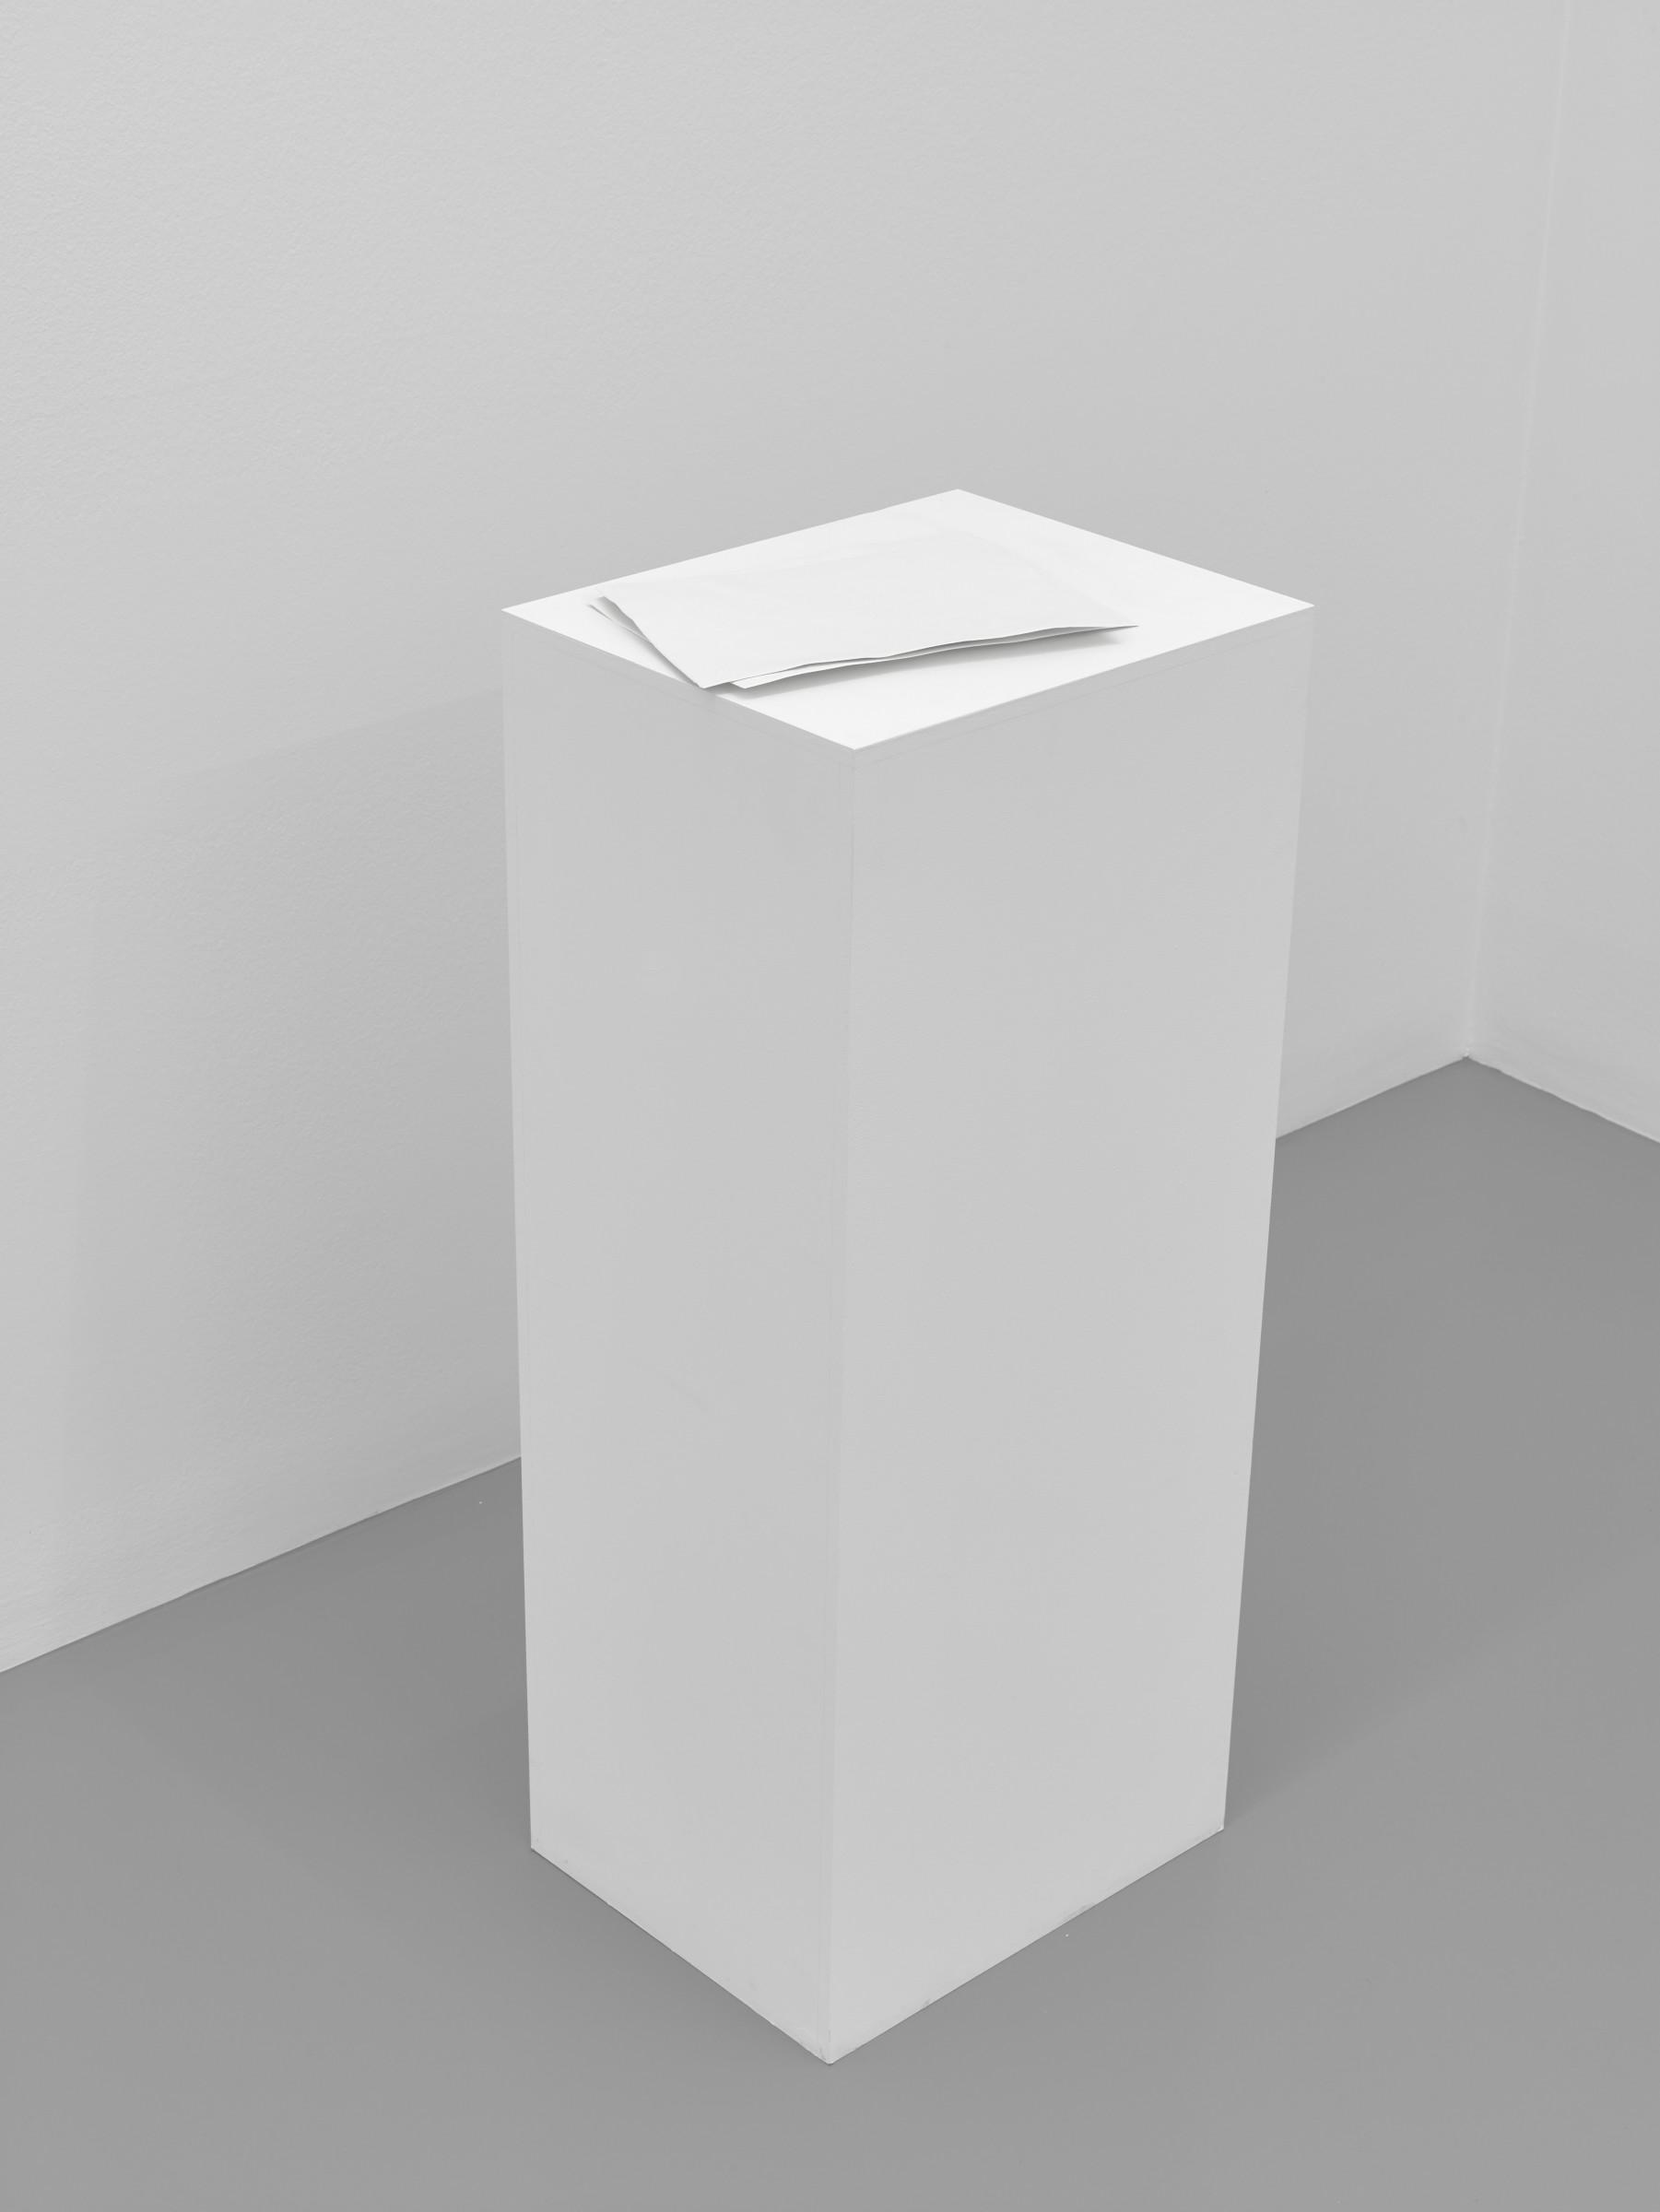 <span class=&#34;link fancybox-details-link&#34;><a href=&#34;/exhibitions/167/works/artworks15537/&#34;>View Detail Page</a></span><div class=&#34;artist&#34;><strong>El&#237;sabet Brynhildard&#243;ttir</strong></div><div class=&#34;title&#34;><em>Untitled</em>, 2017</div><div class=&#34;medium&#34;>plaster</div><div class=&#34;dimensions&#34;>two A4 sheets<br>installed:<br>2 x 22,5 x 34 cm<br></div><div class=&#34;edition_details&#34;></div>